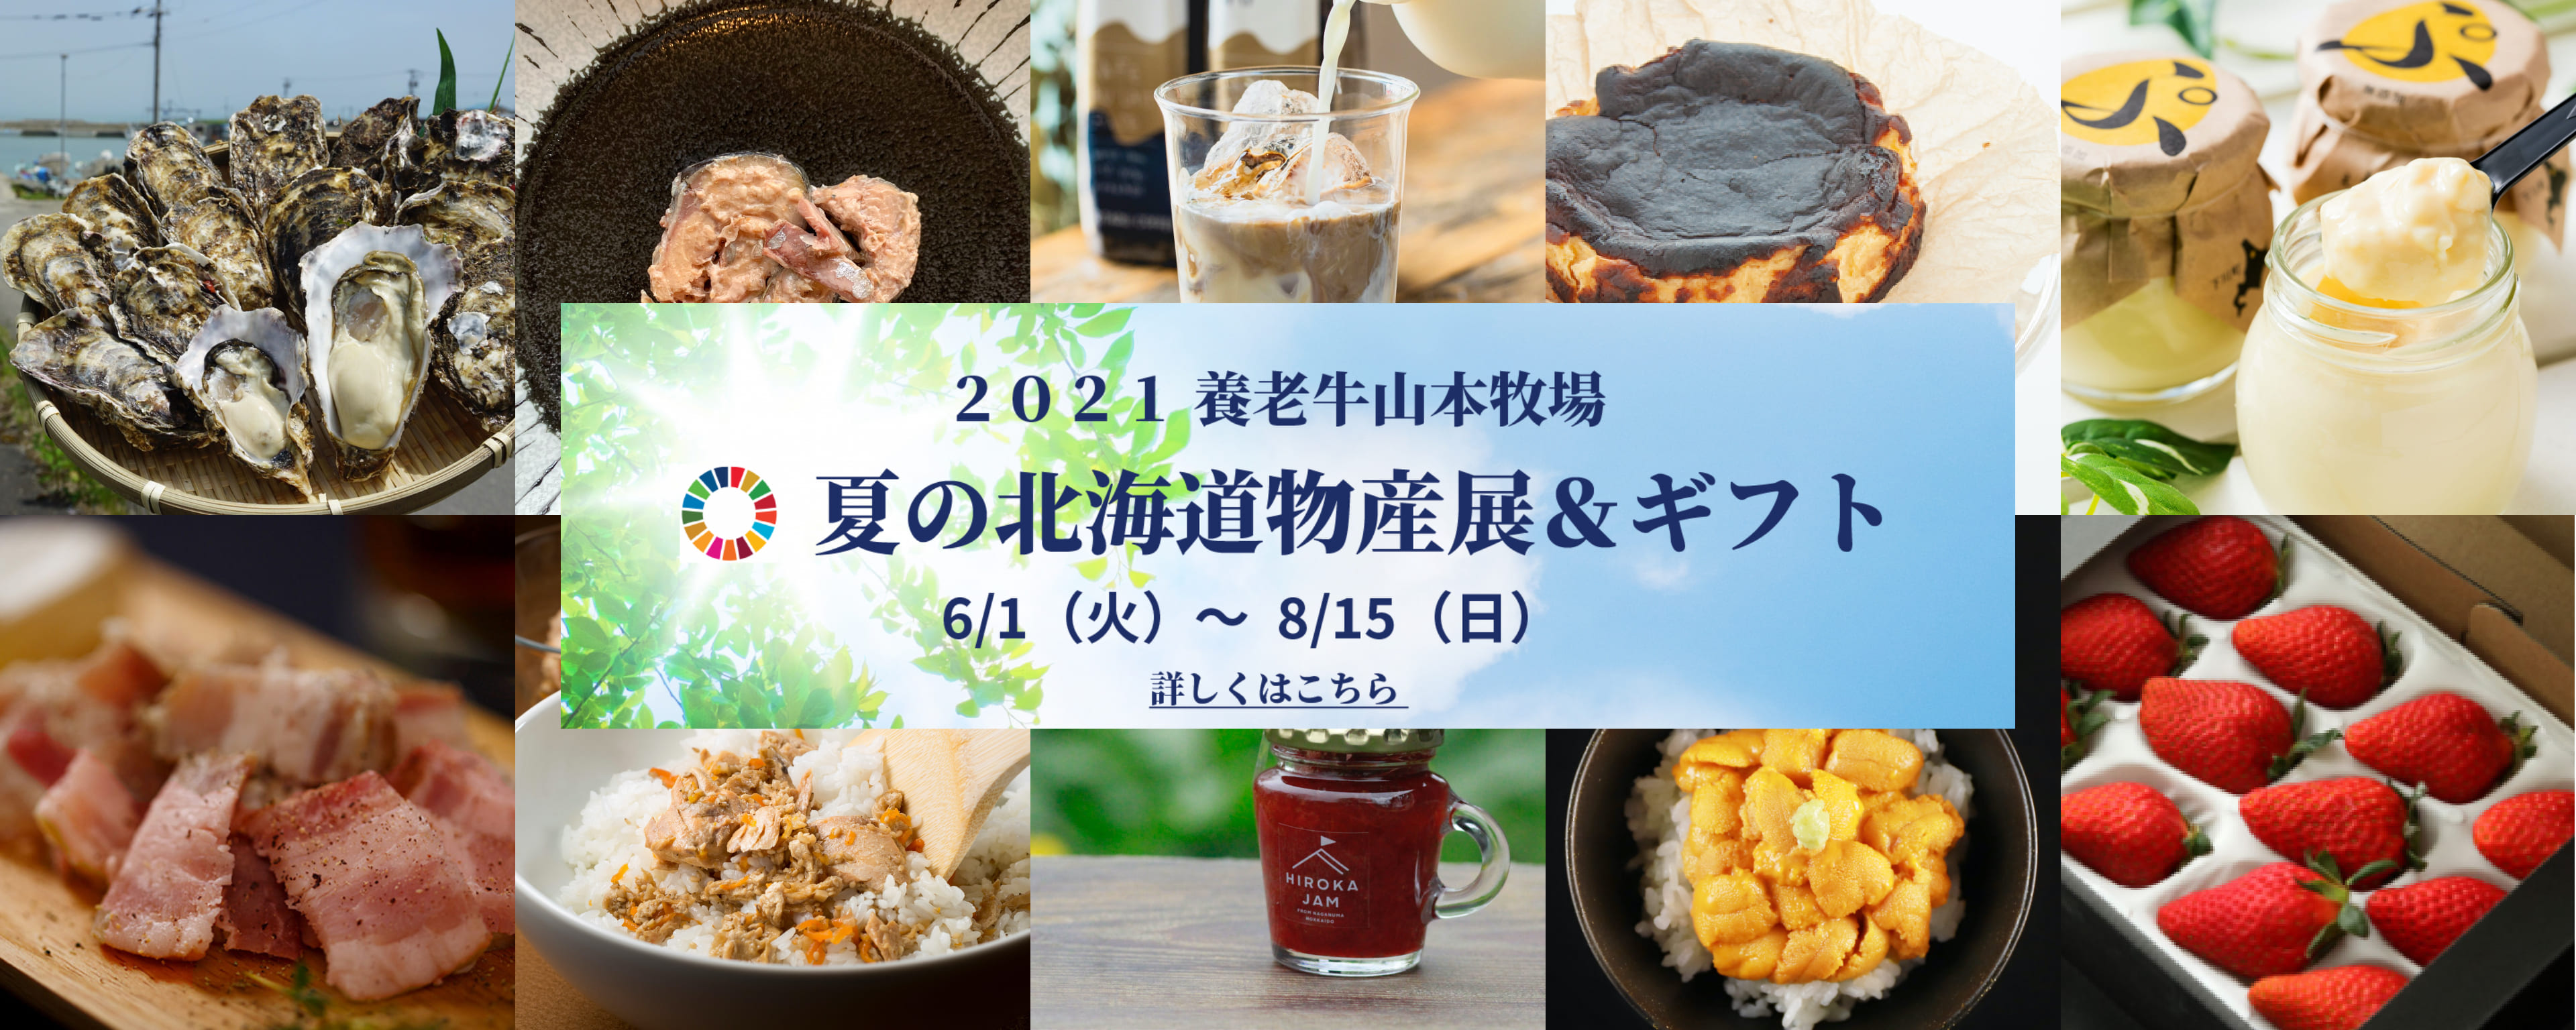 2021年北海道夏の物産展